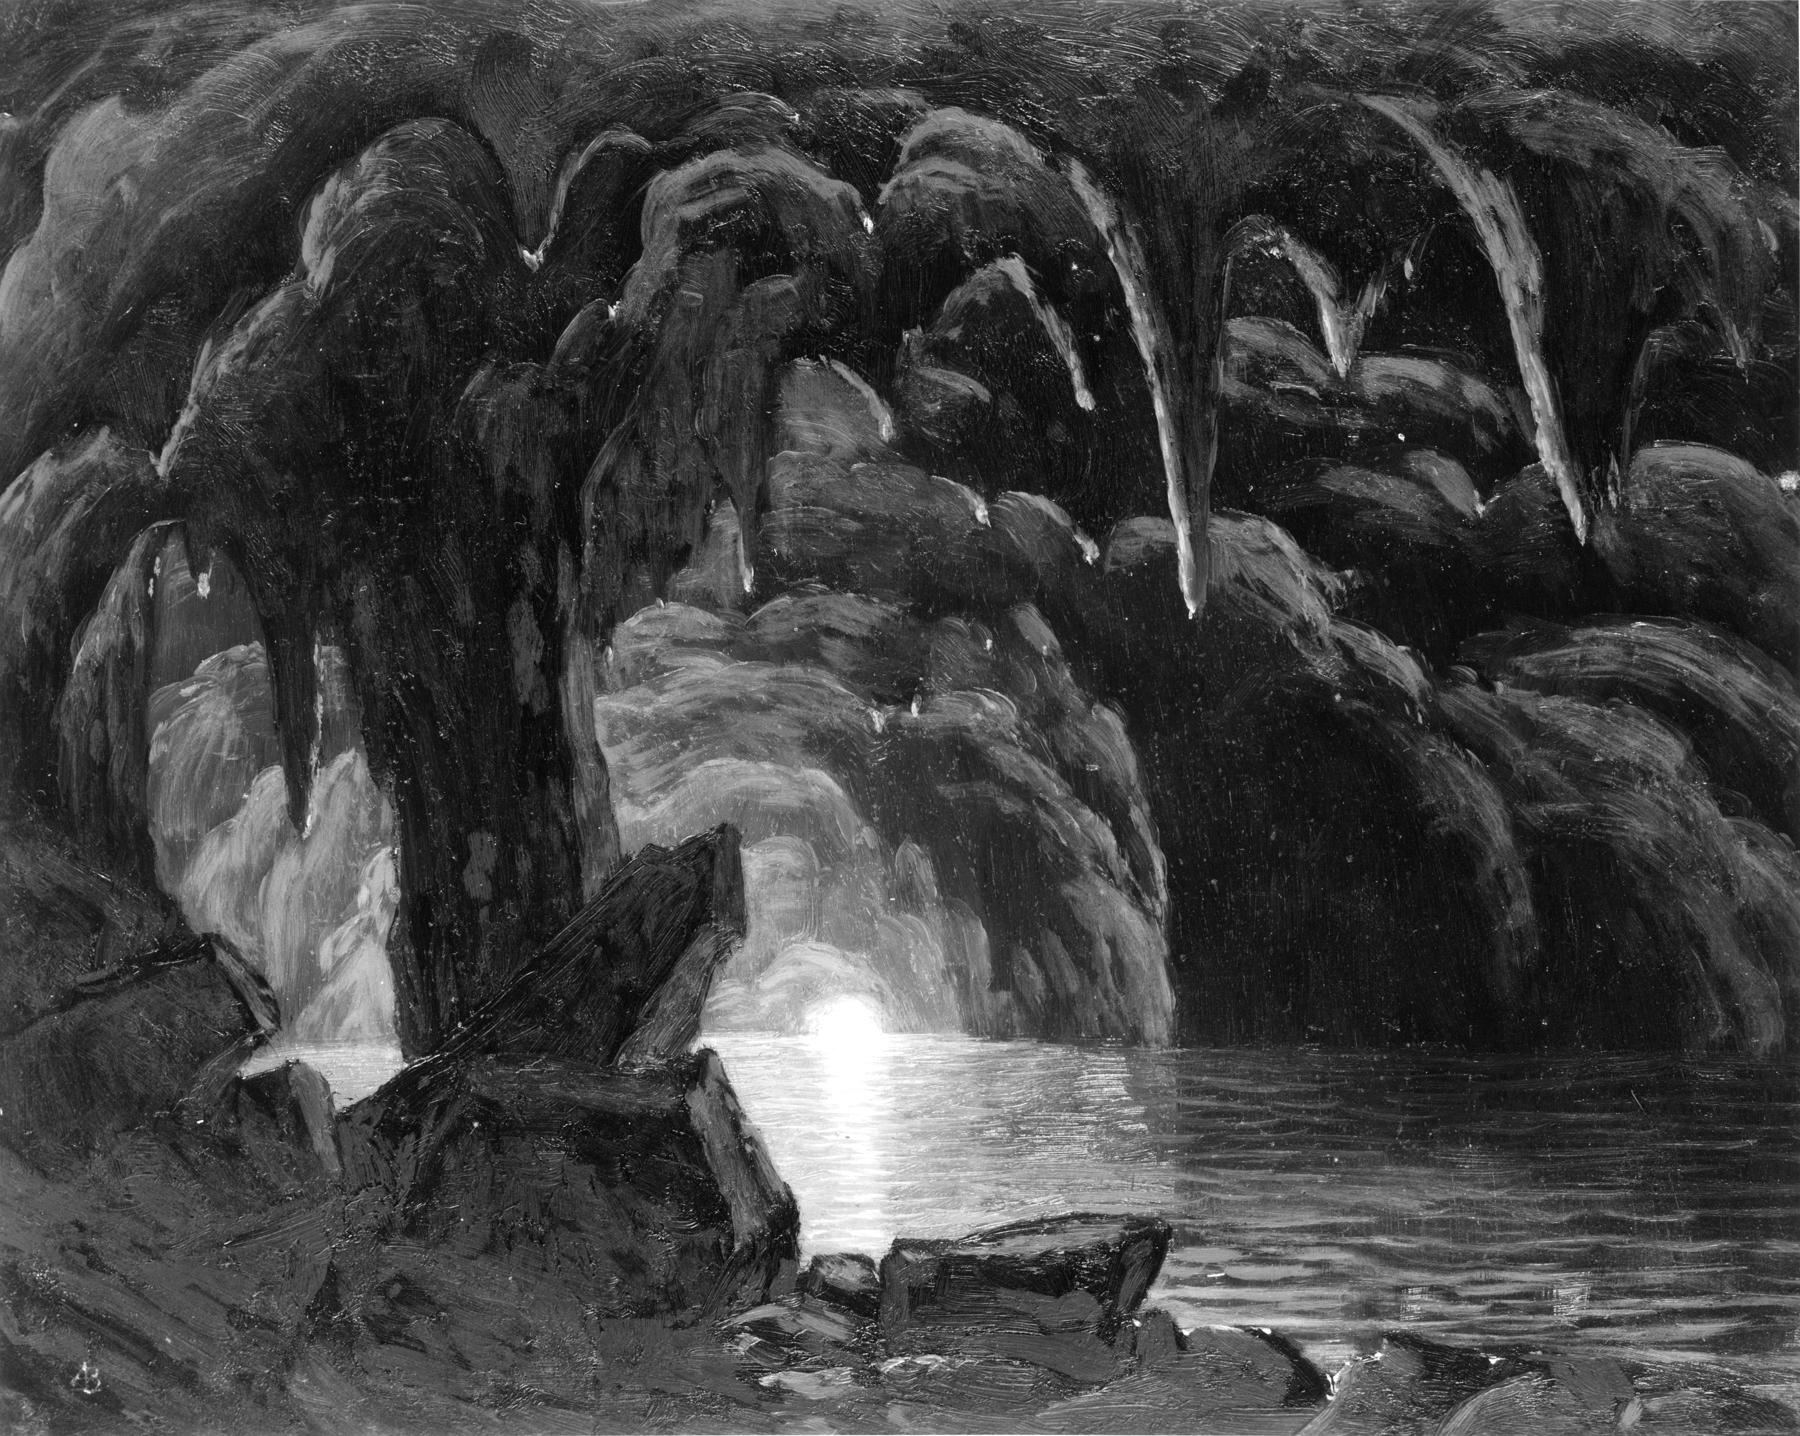 Naples To Capri >> File:Albert Bierstadt - The Blue Grotto, Capri - Walters 371565.jpg - Wikimedia Commons